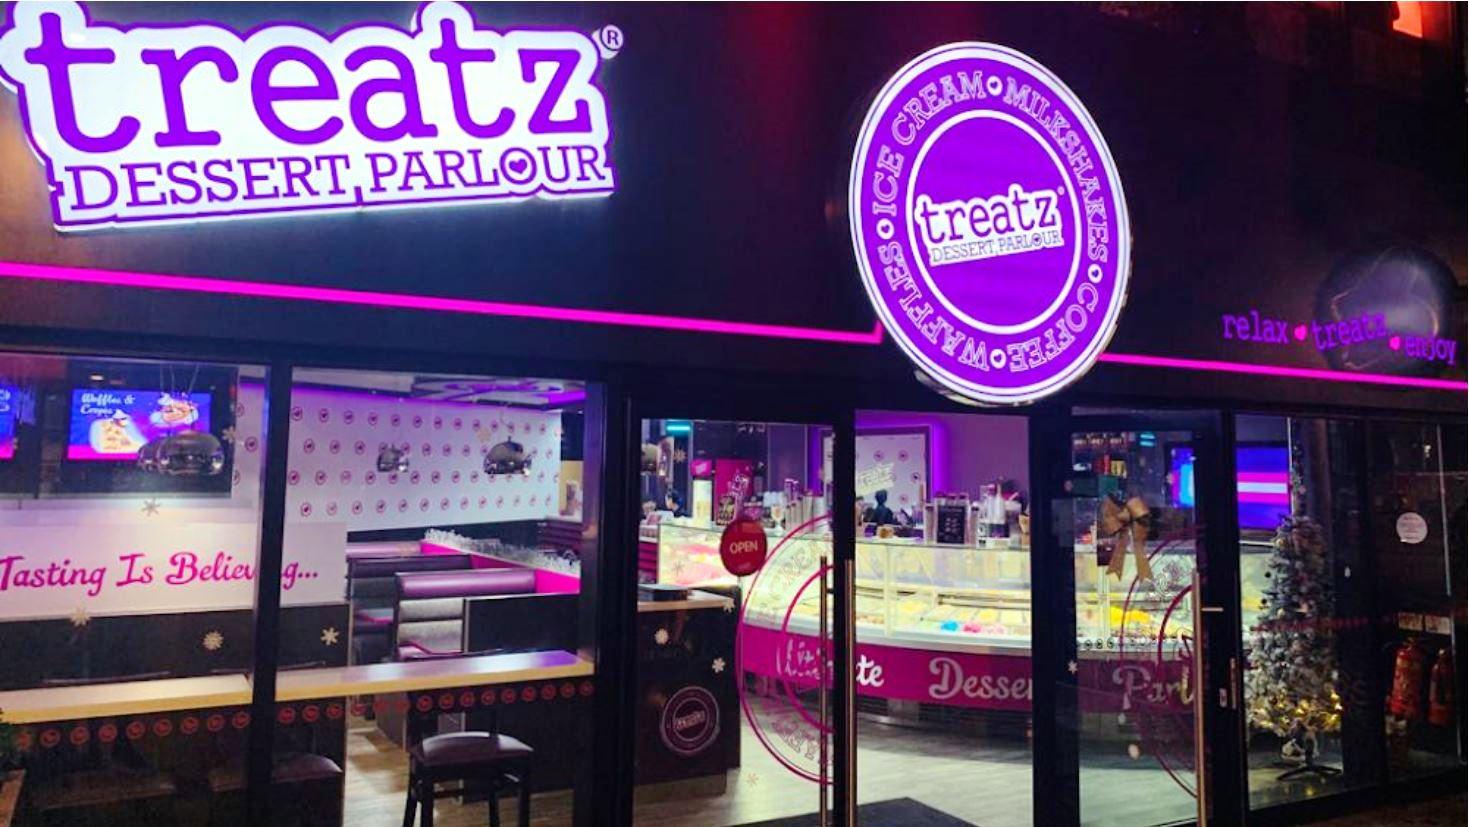 Treatz Dessert Parlour Wembley